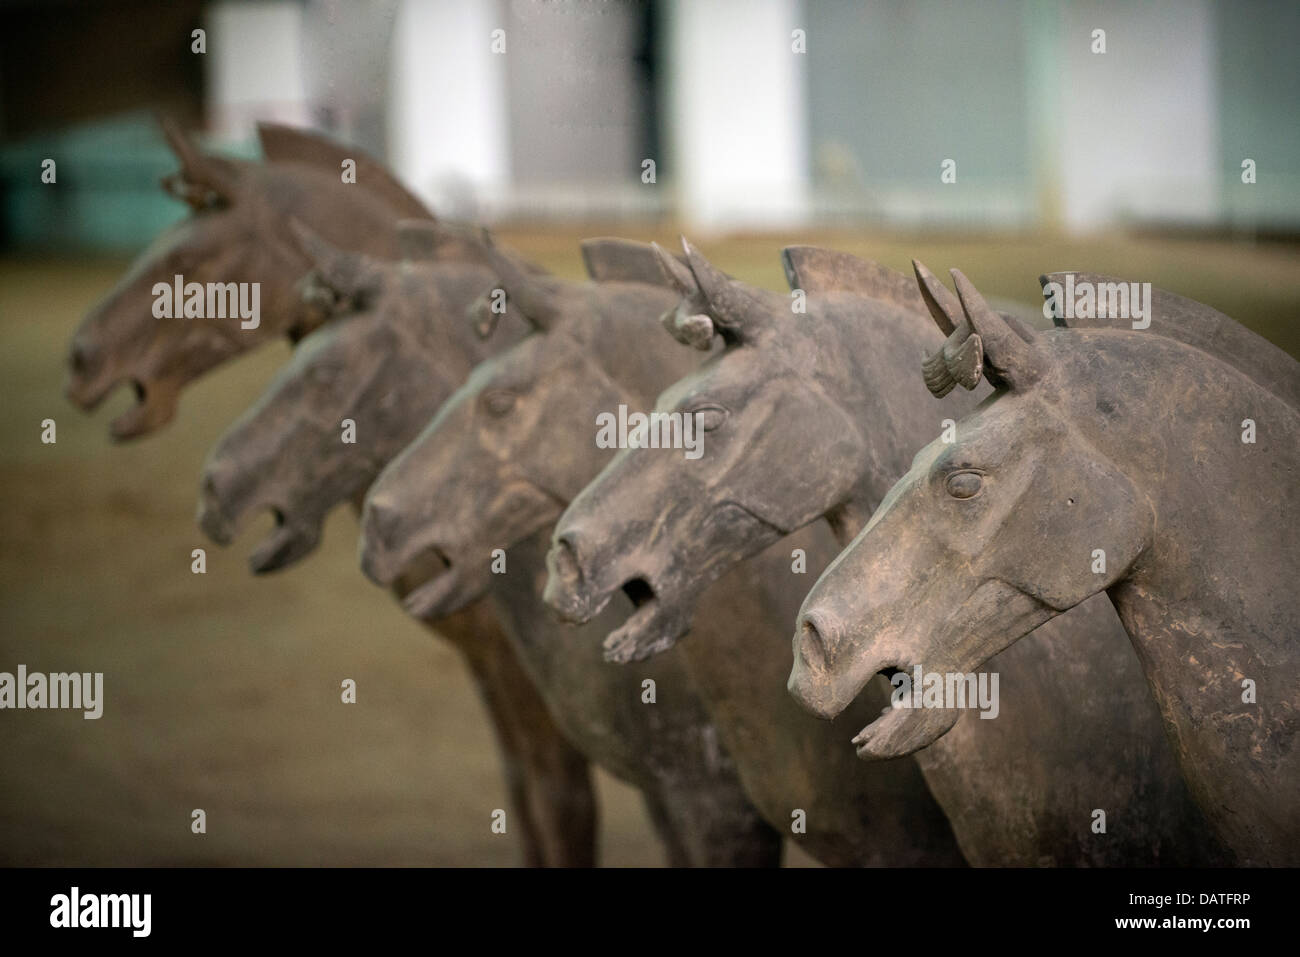 Xi'an terracotta horses, China - Stock Image